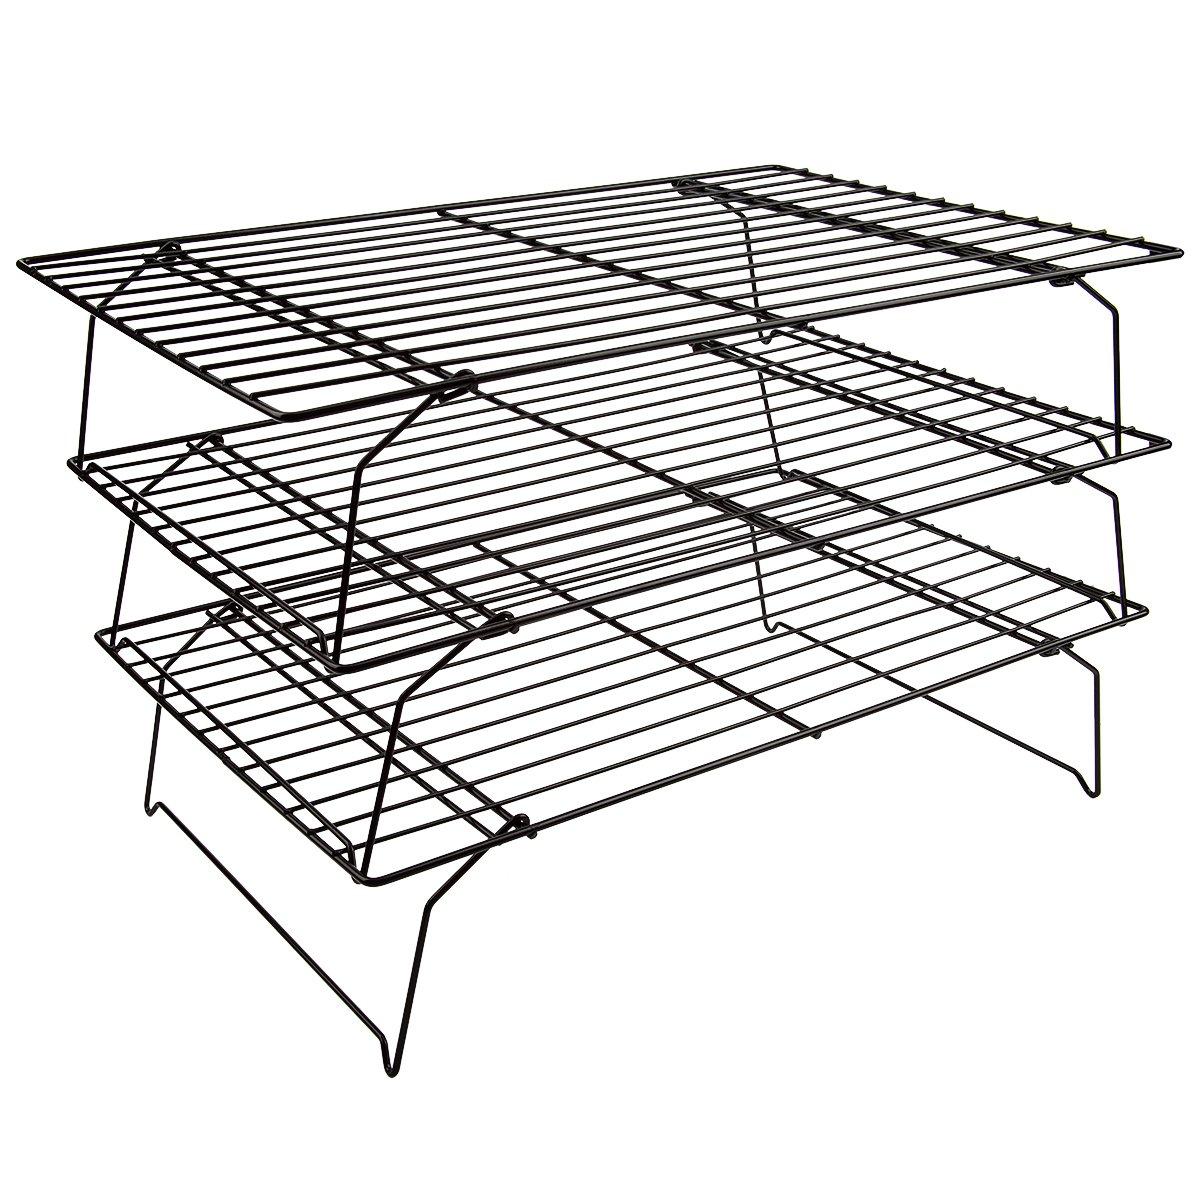 Amazon.com: Cooling Racks: Home & Kitchen